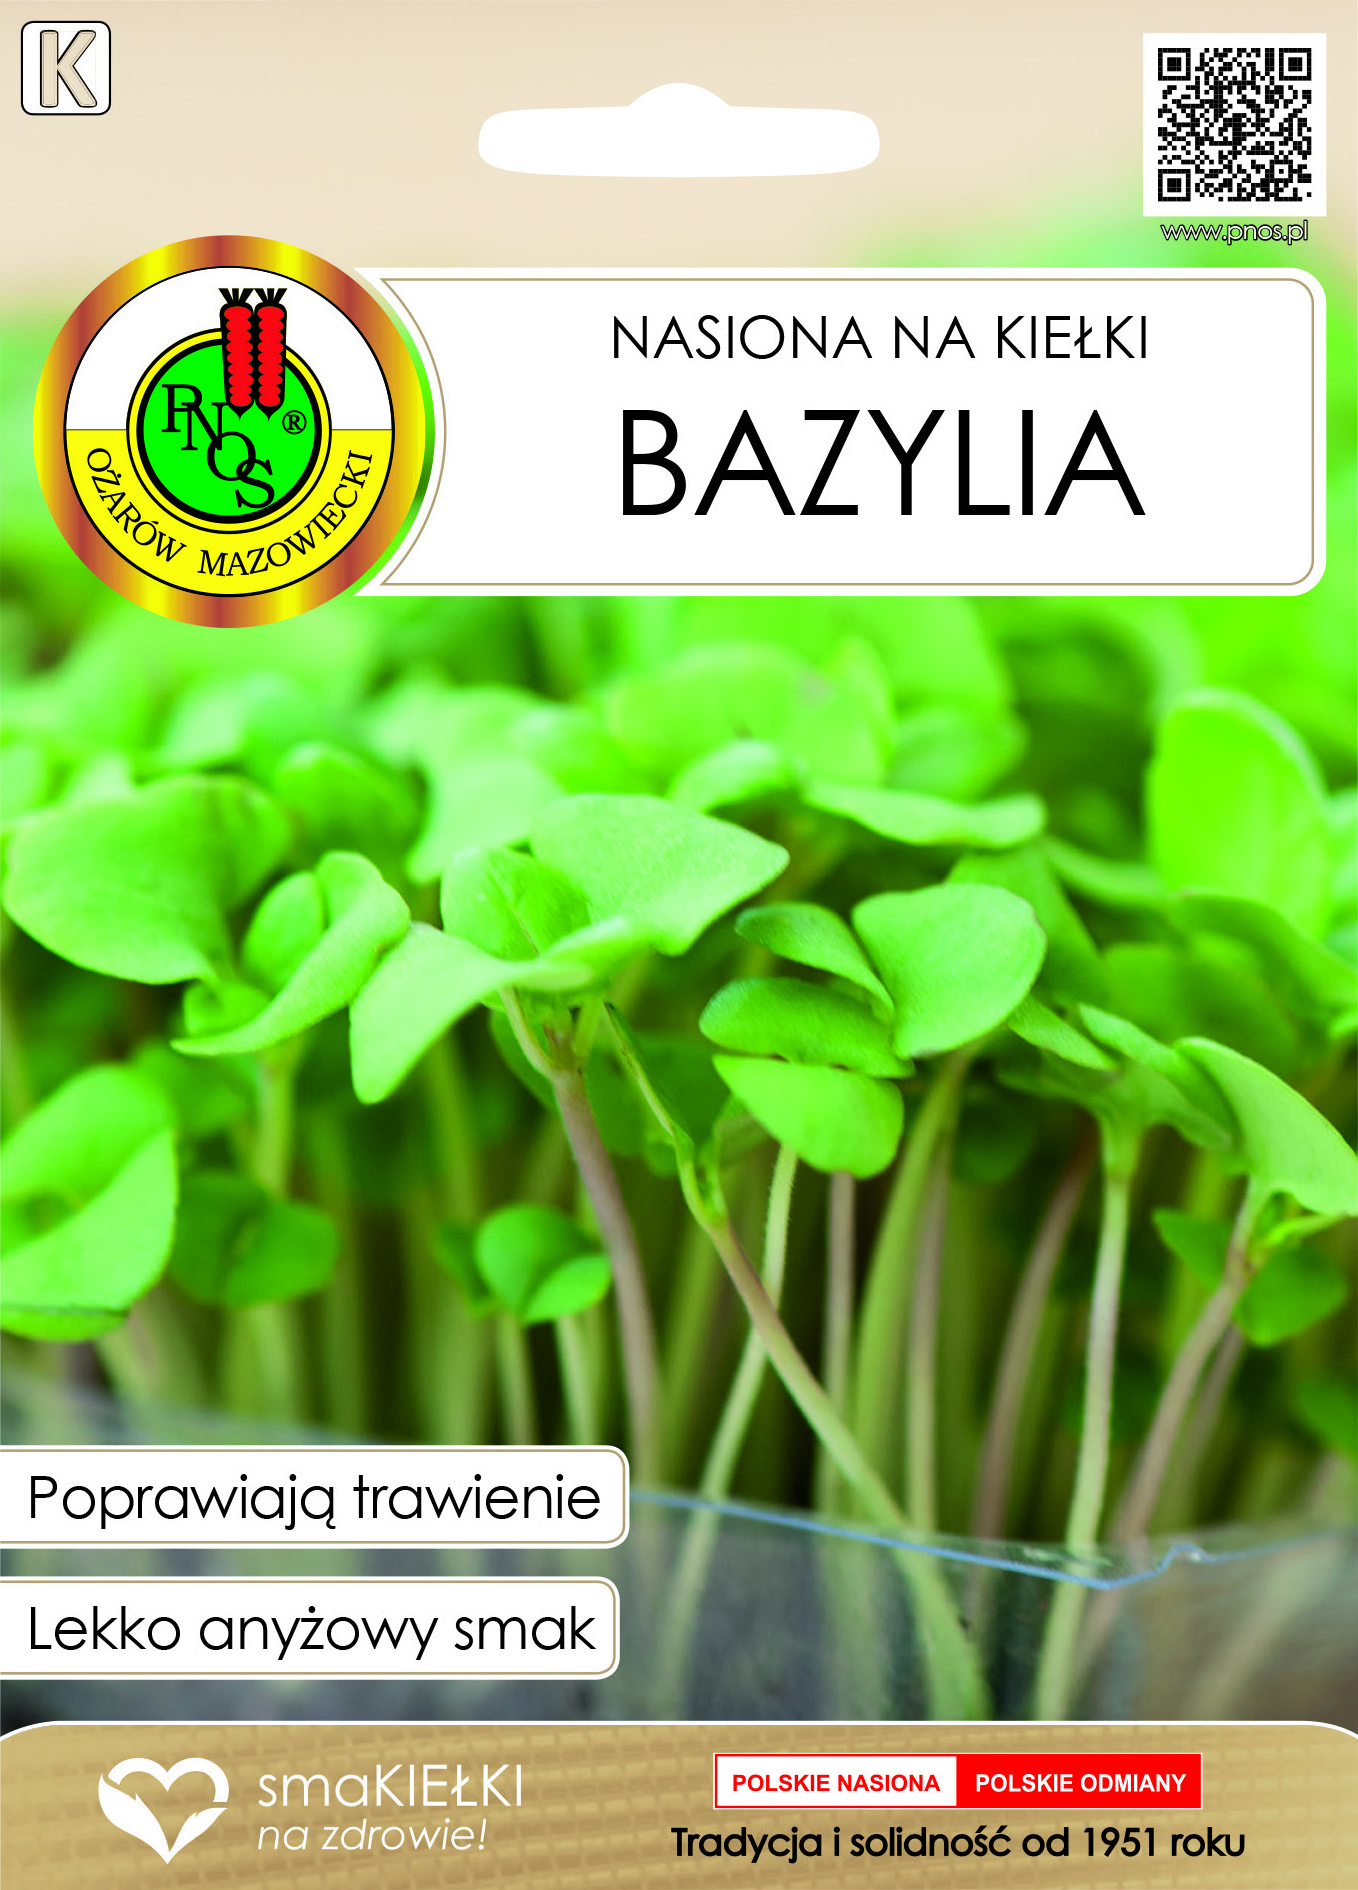 NASIONA_NA_KIELKI_BAZYLIA